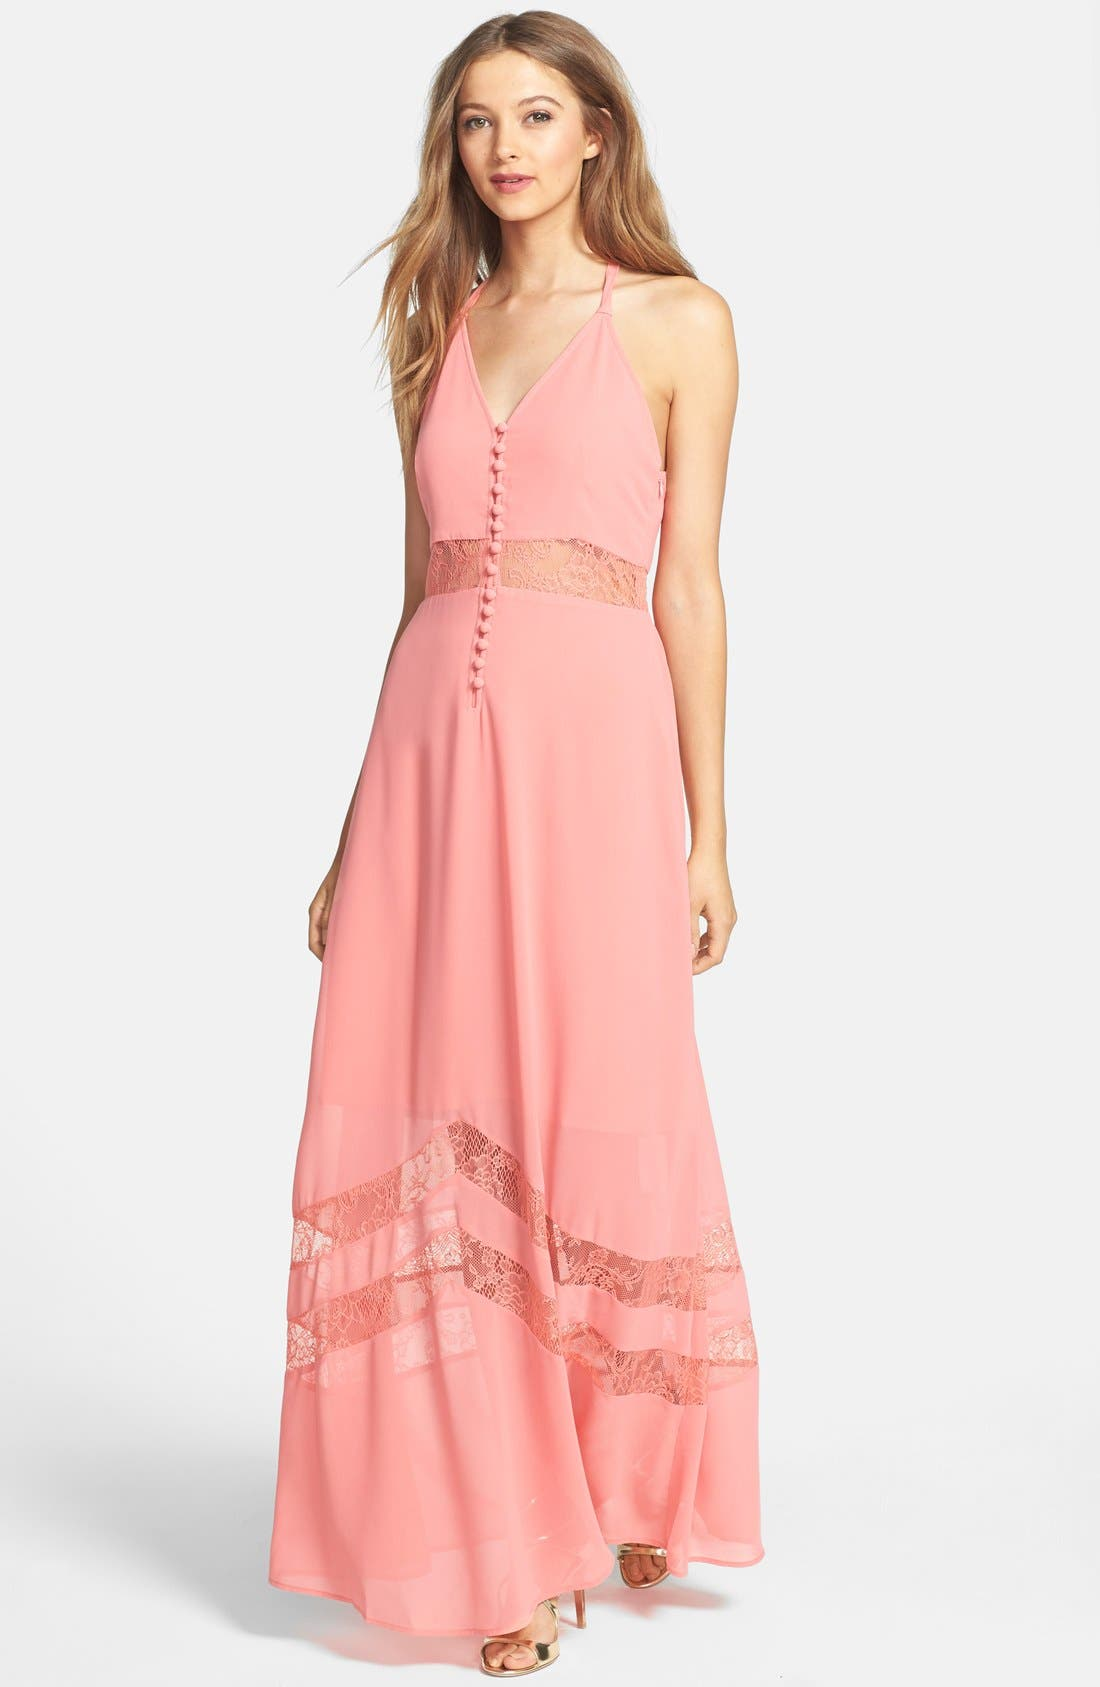 Main Image - Jarlo 'Sienna' Lace Inset T-Back Chiffon Gown